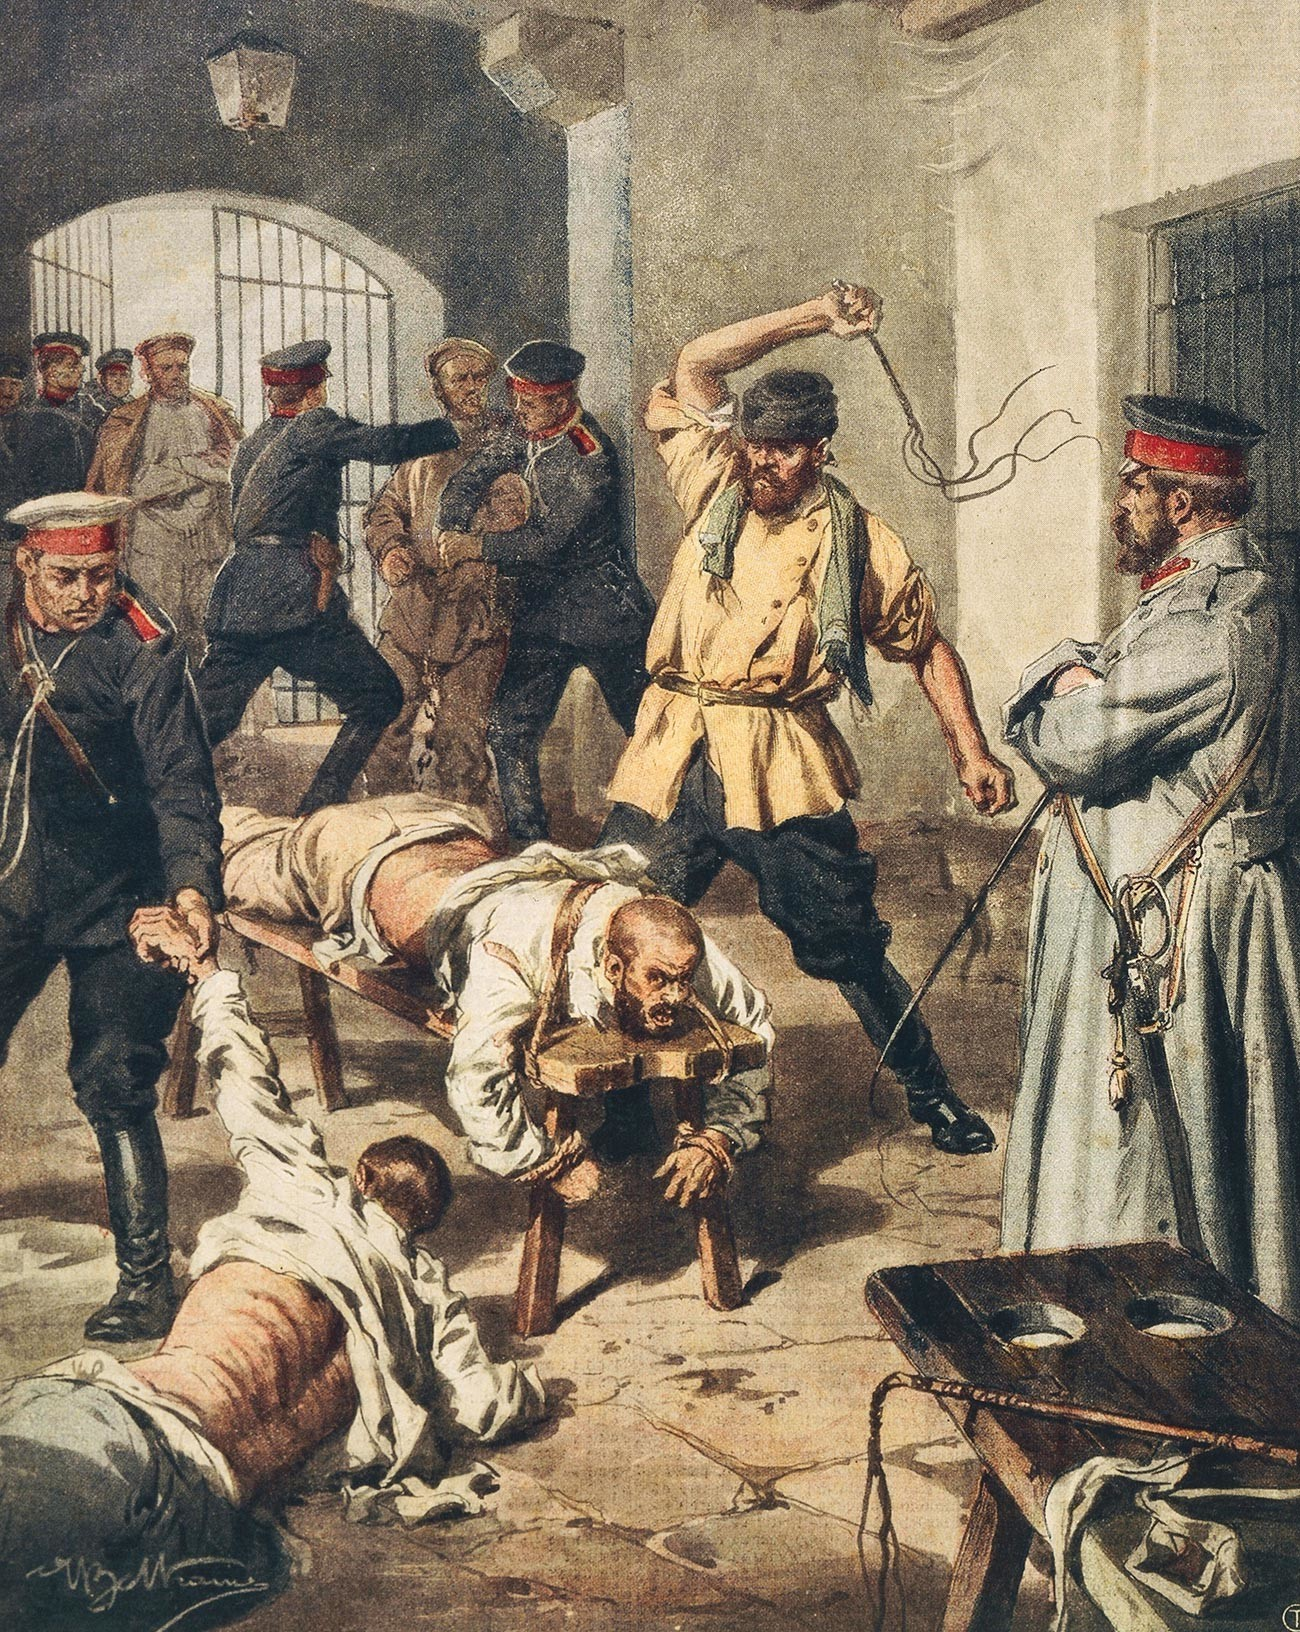 Penderaan (dari Achille Beltrame, La Domenica del Corriere. Kengerian penjara Rusia)